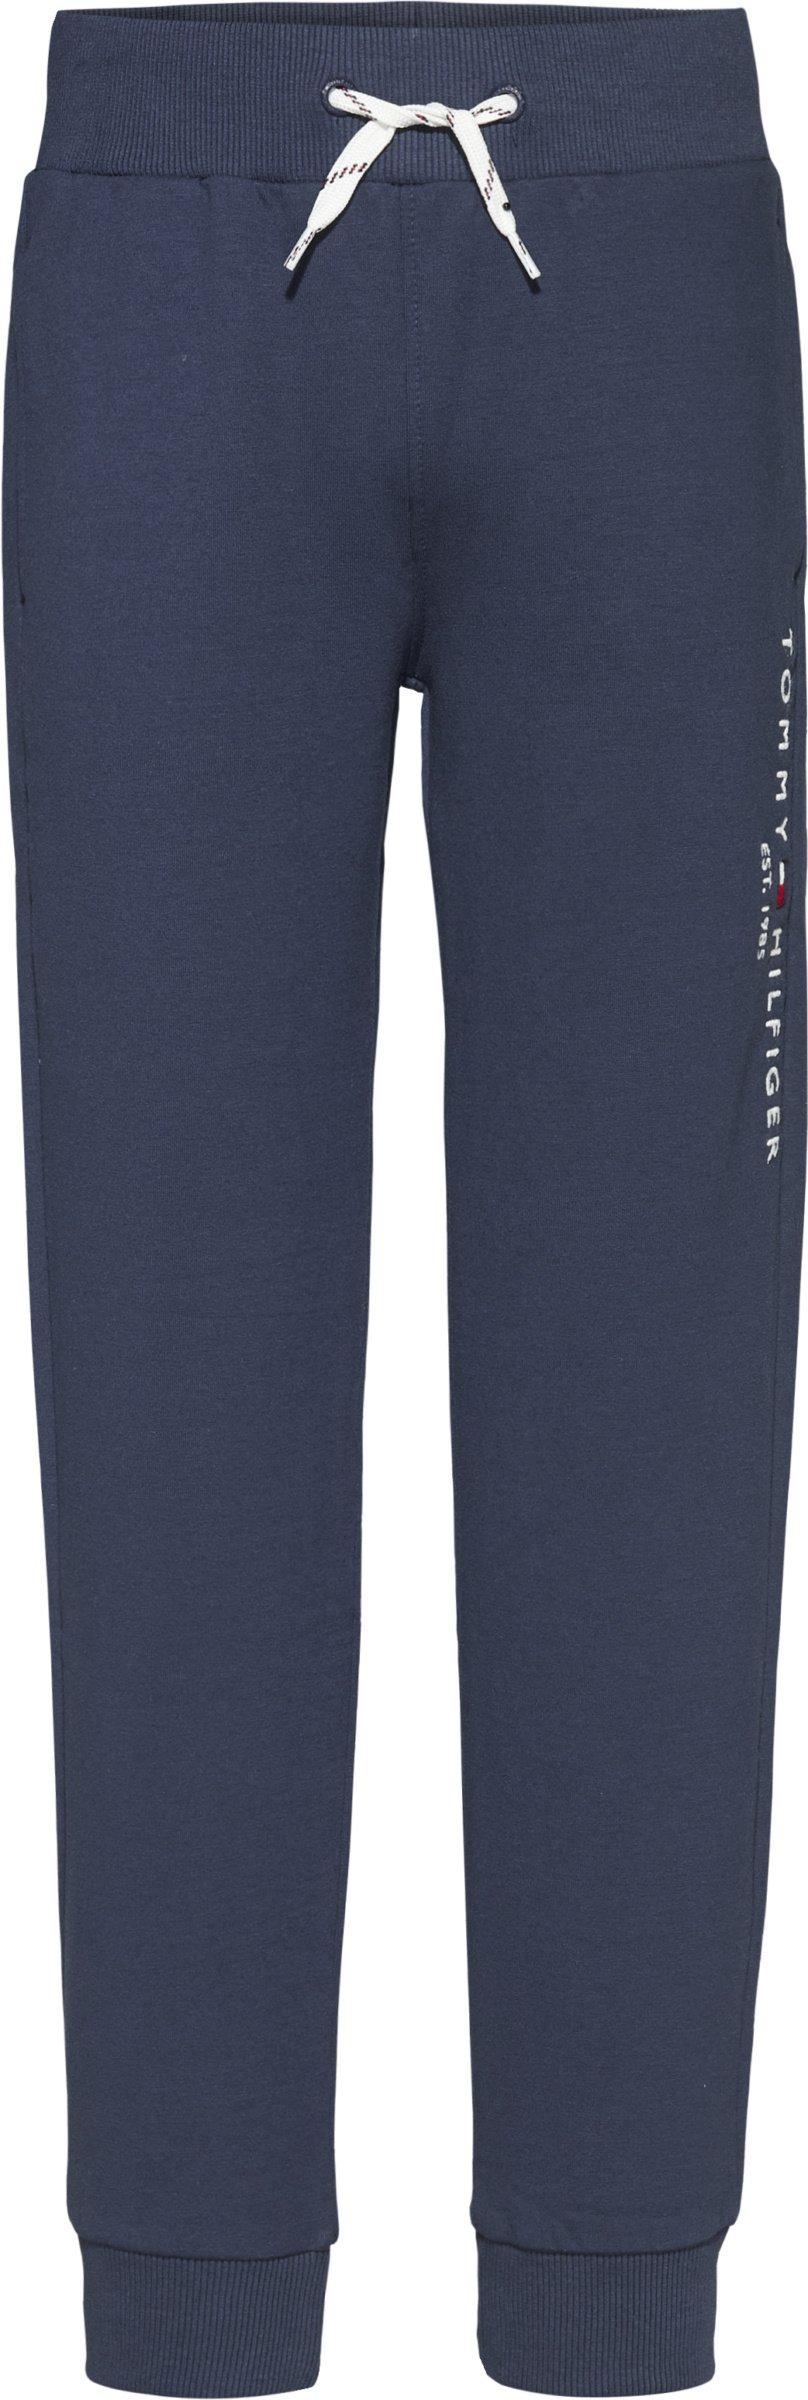 Tommy Hilfiger, Essential sweatpants collegehousut nuorille